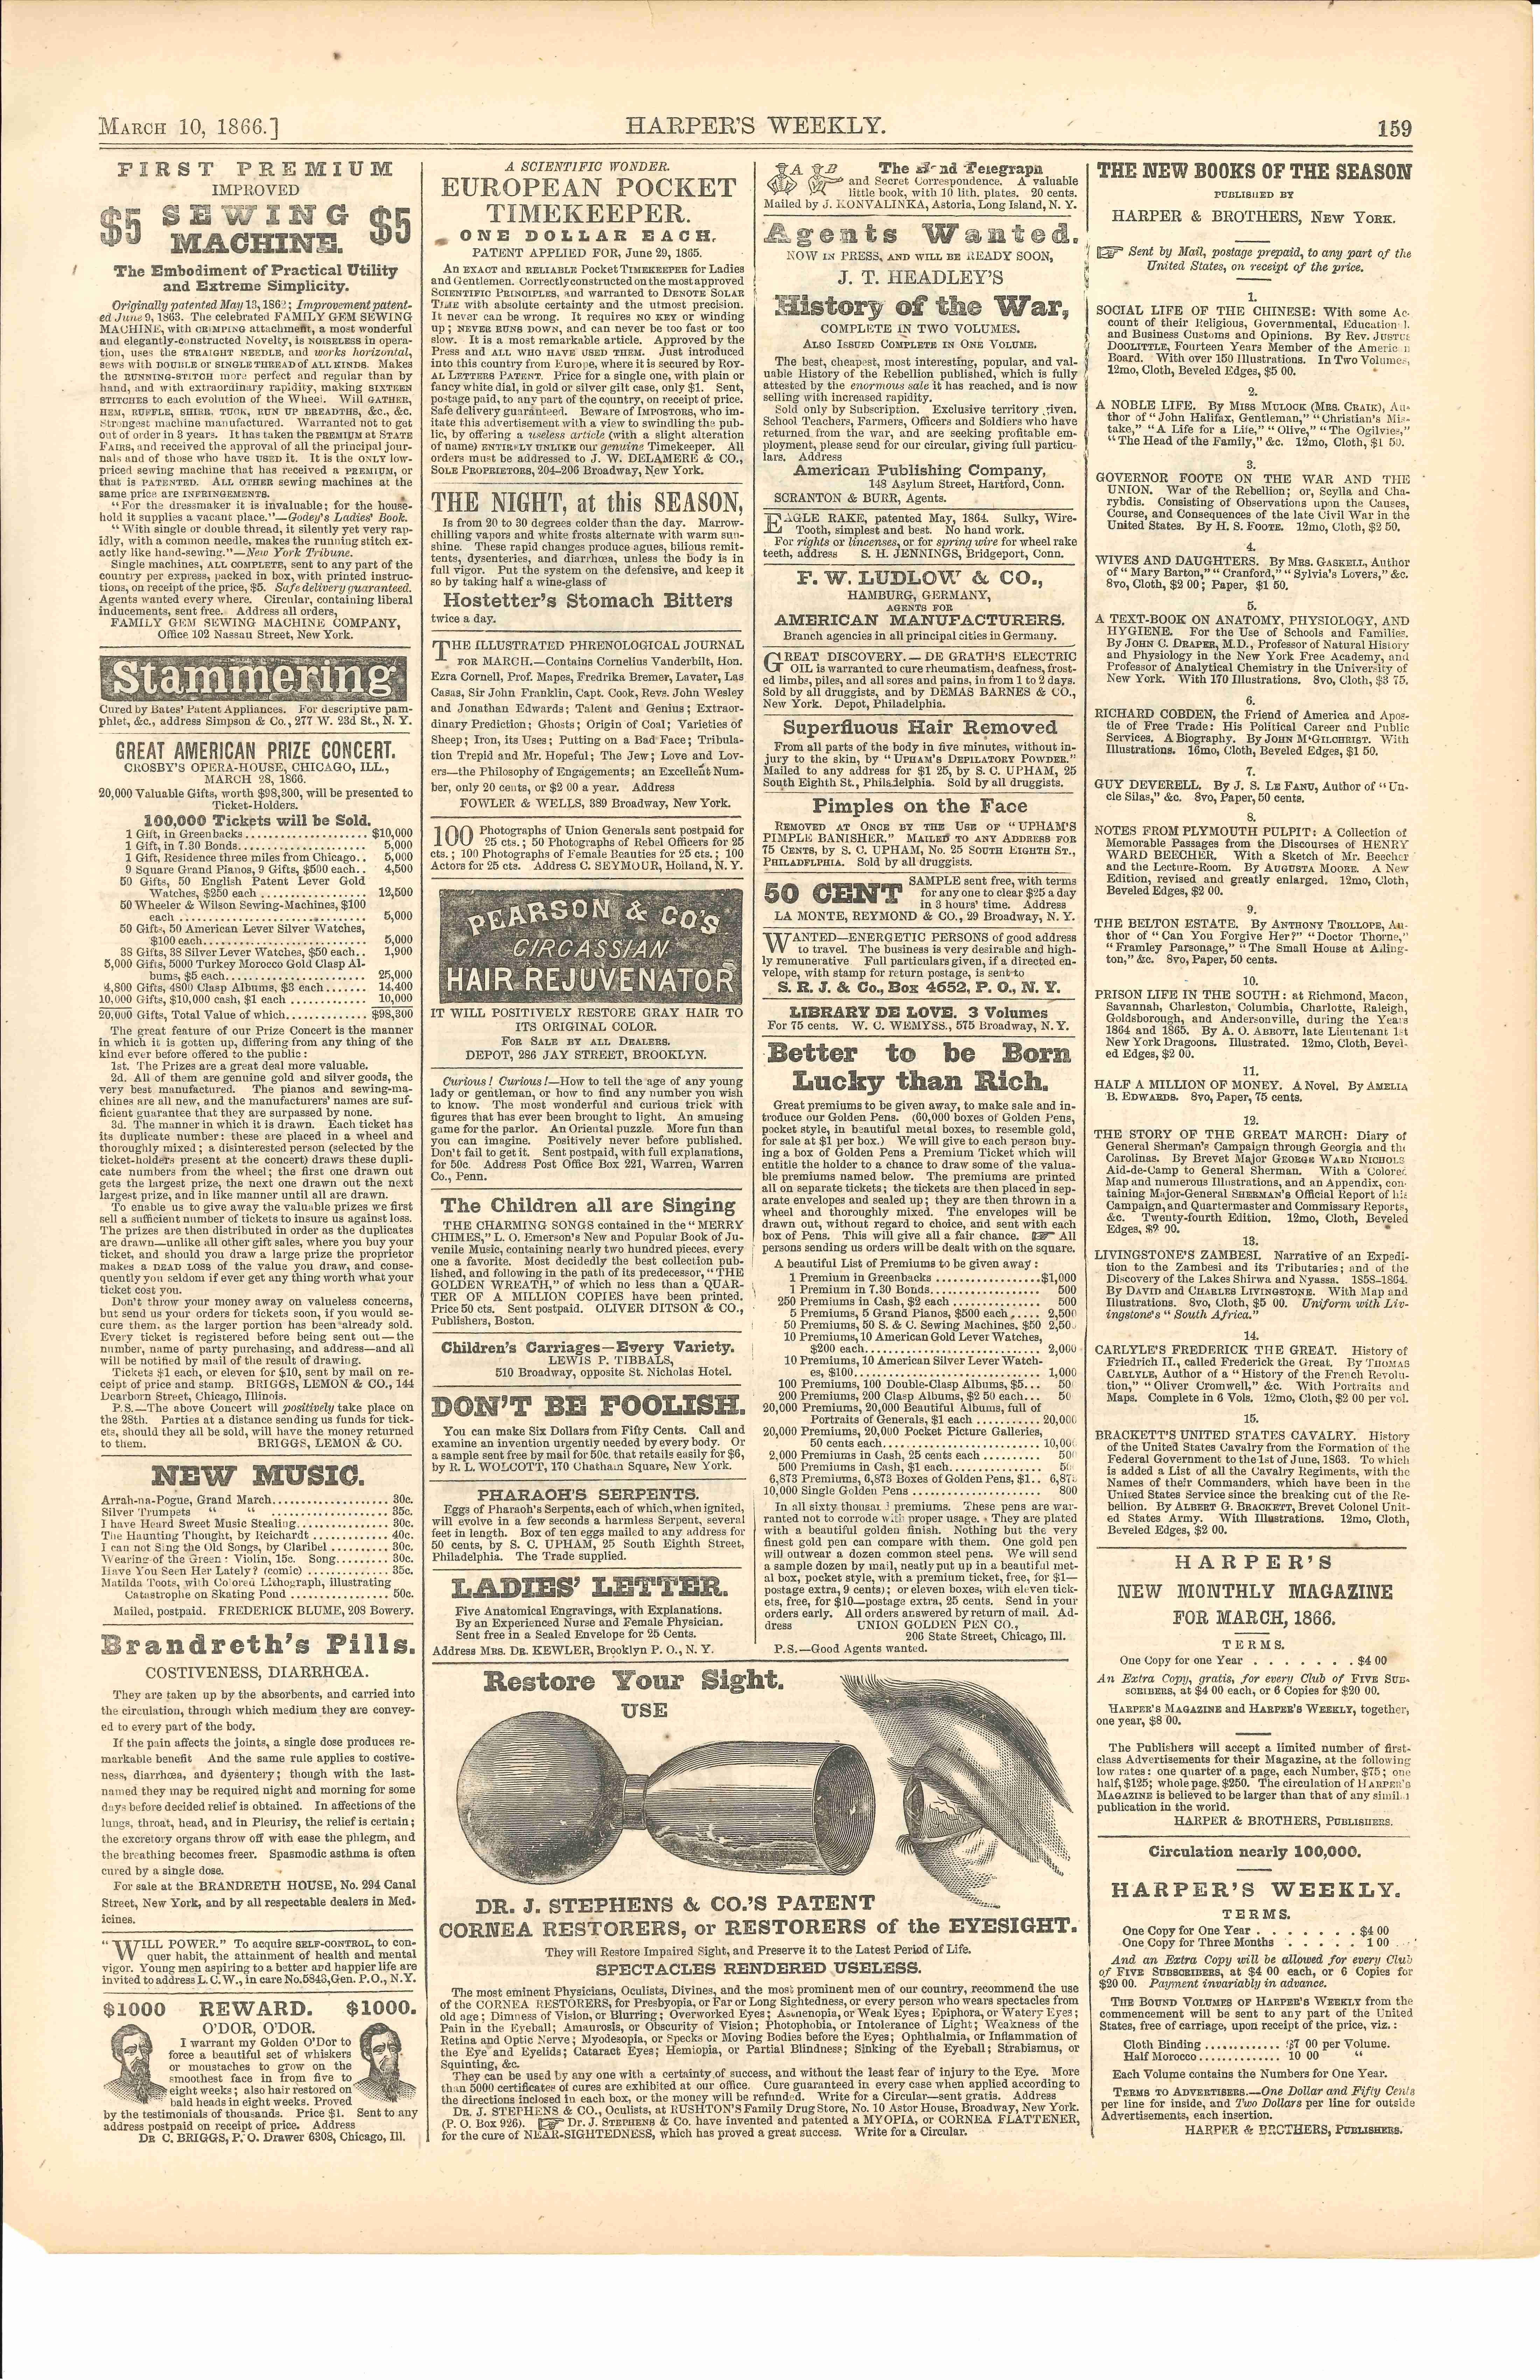 Harpers Weekly 1866 Improve Intellect - back.jpg